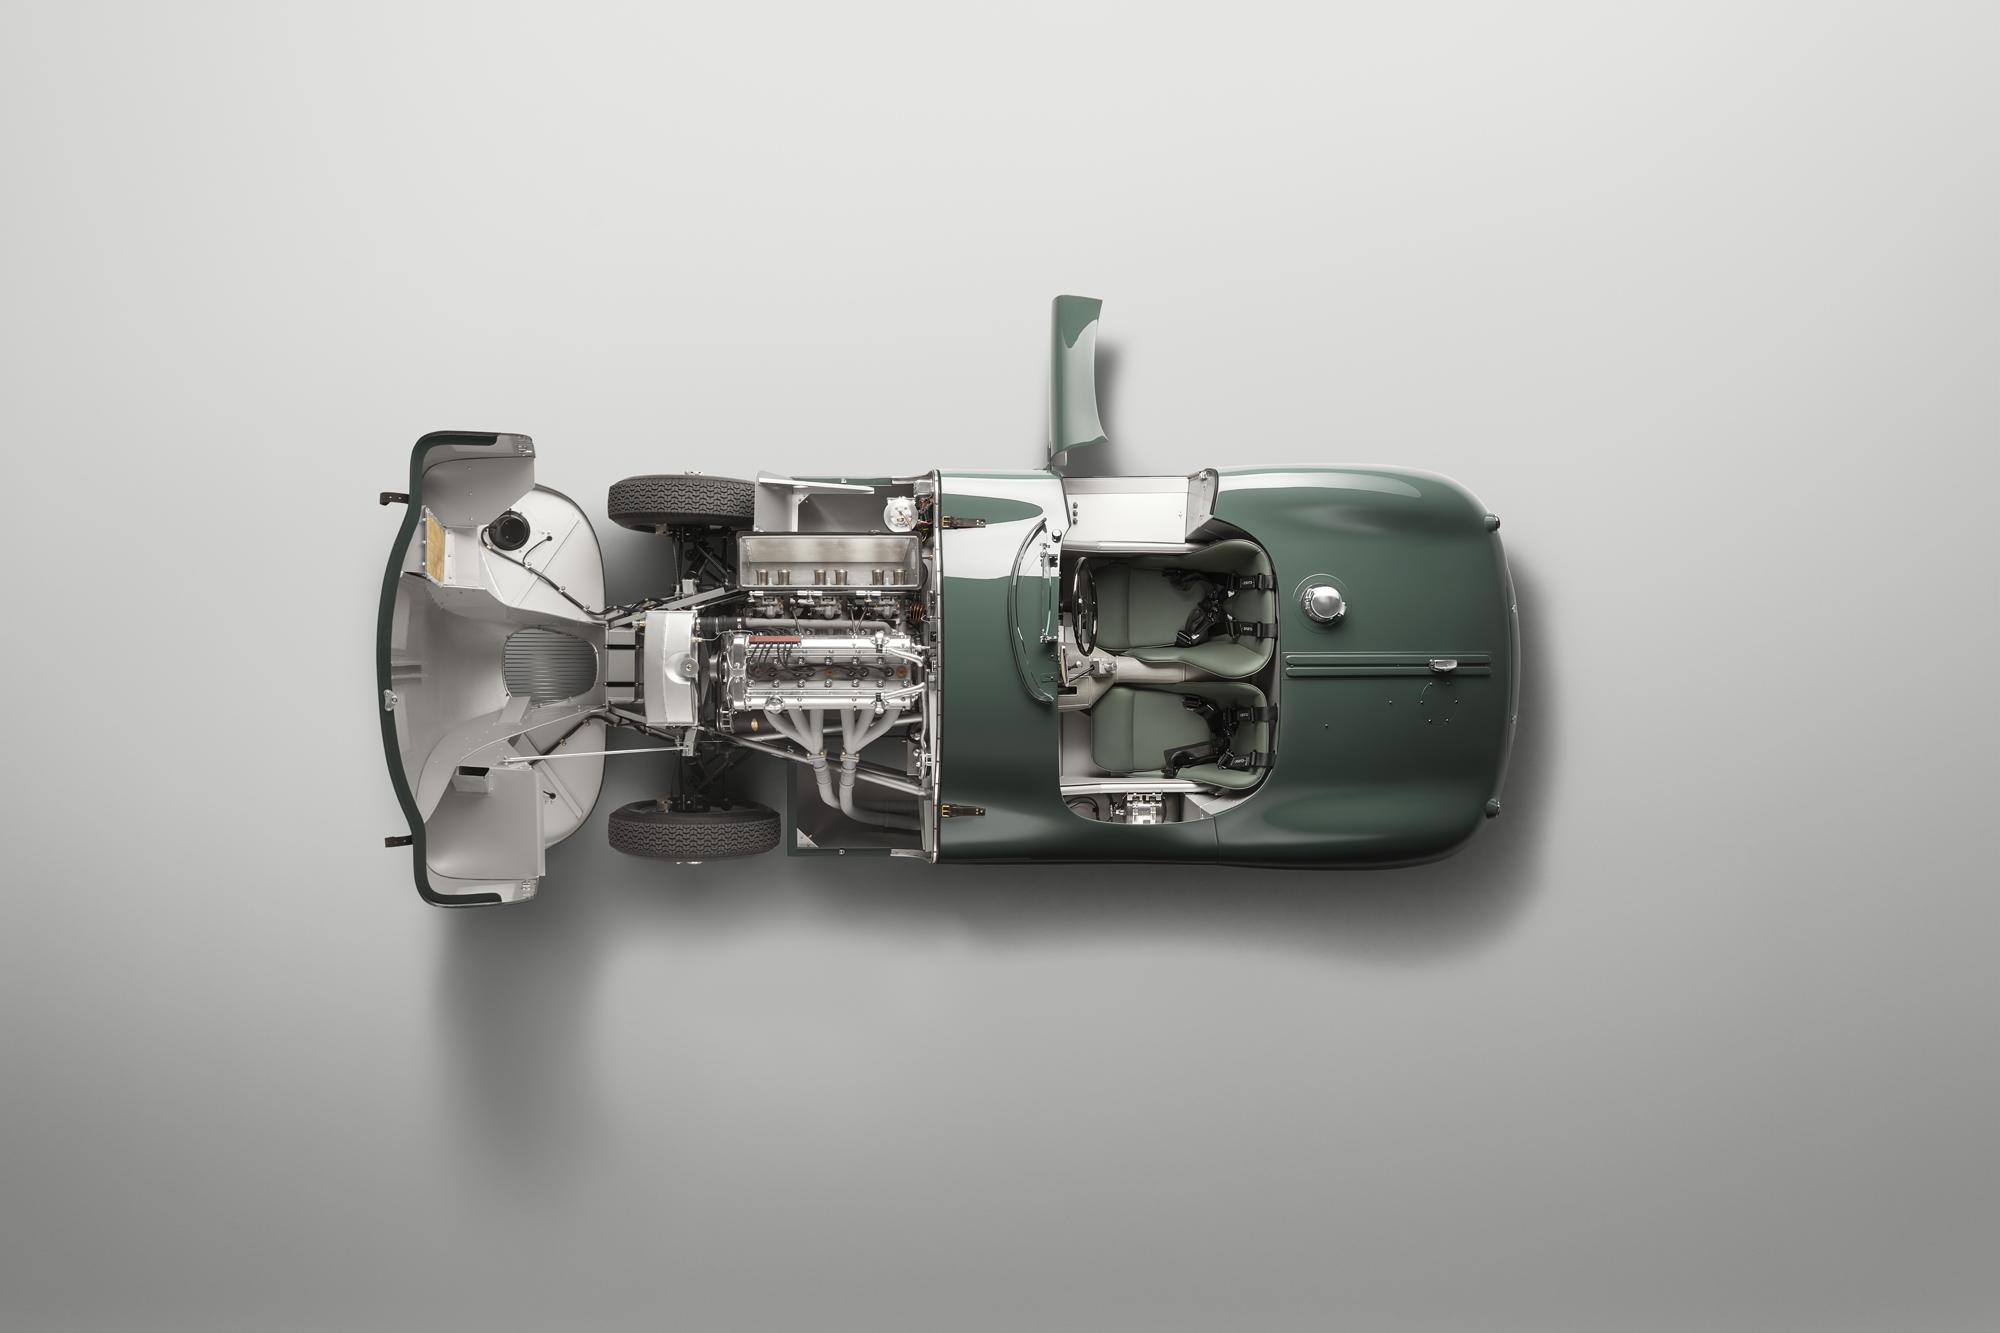 Jaguar C-type continuation top